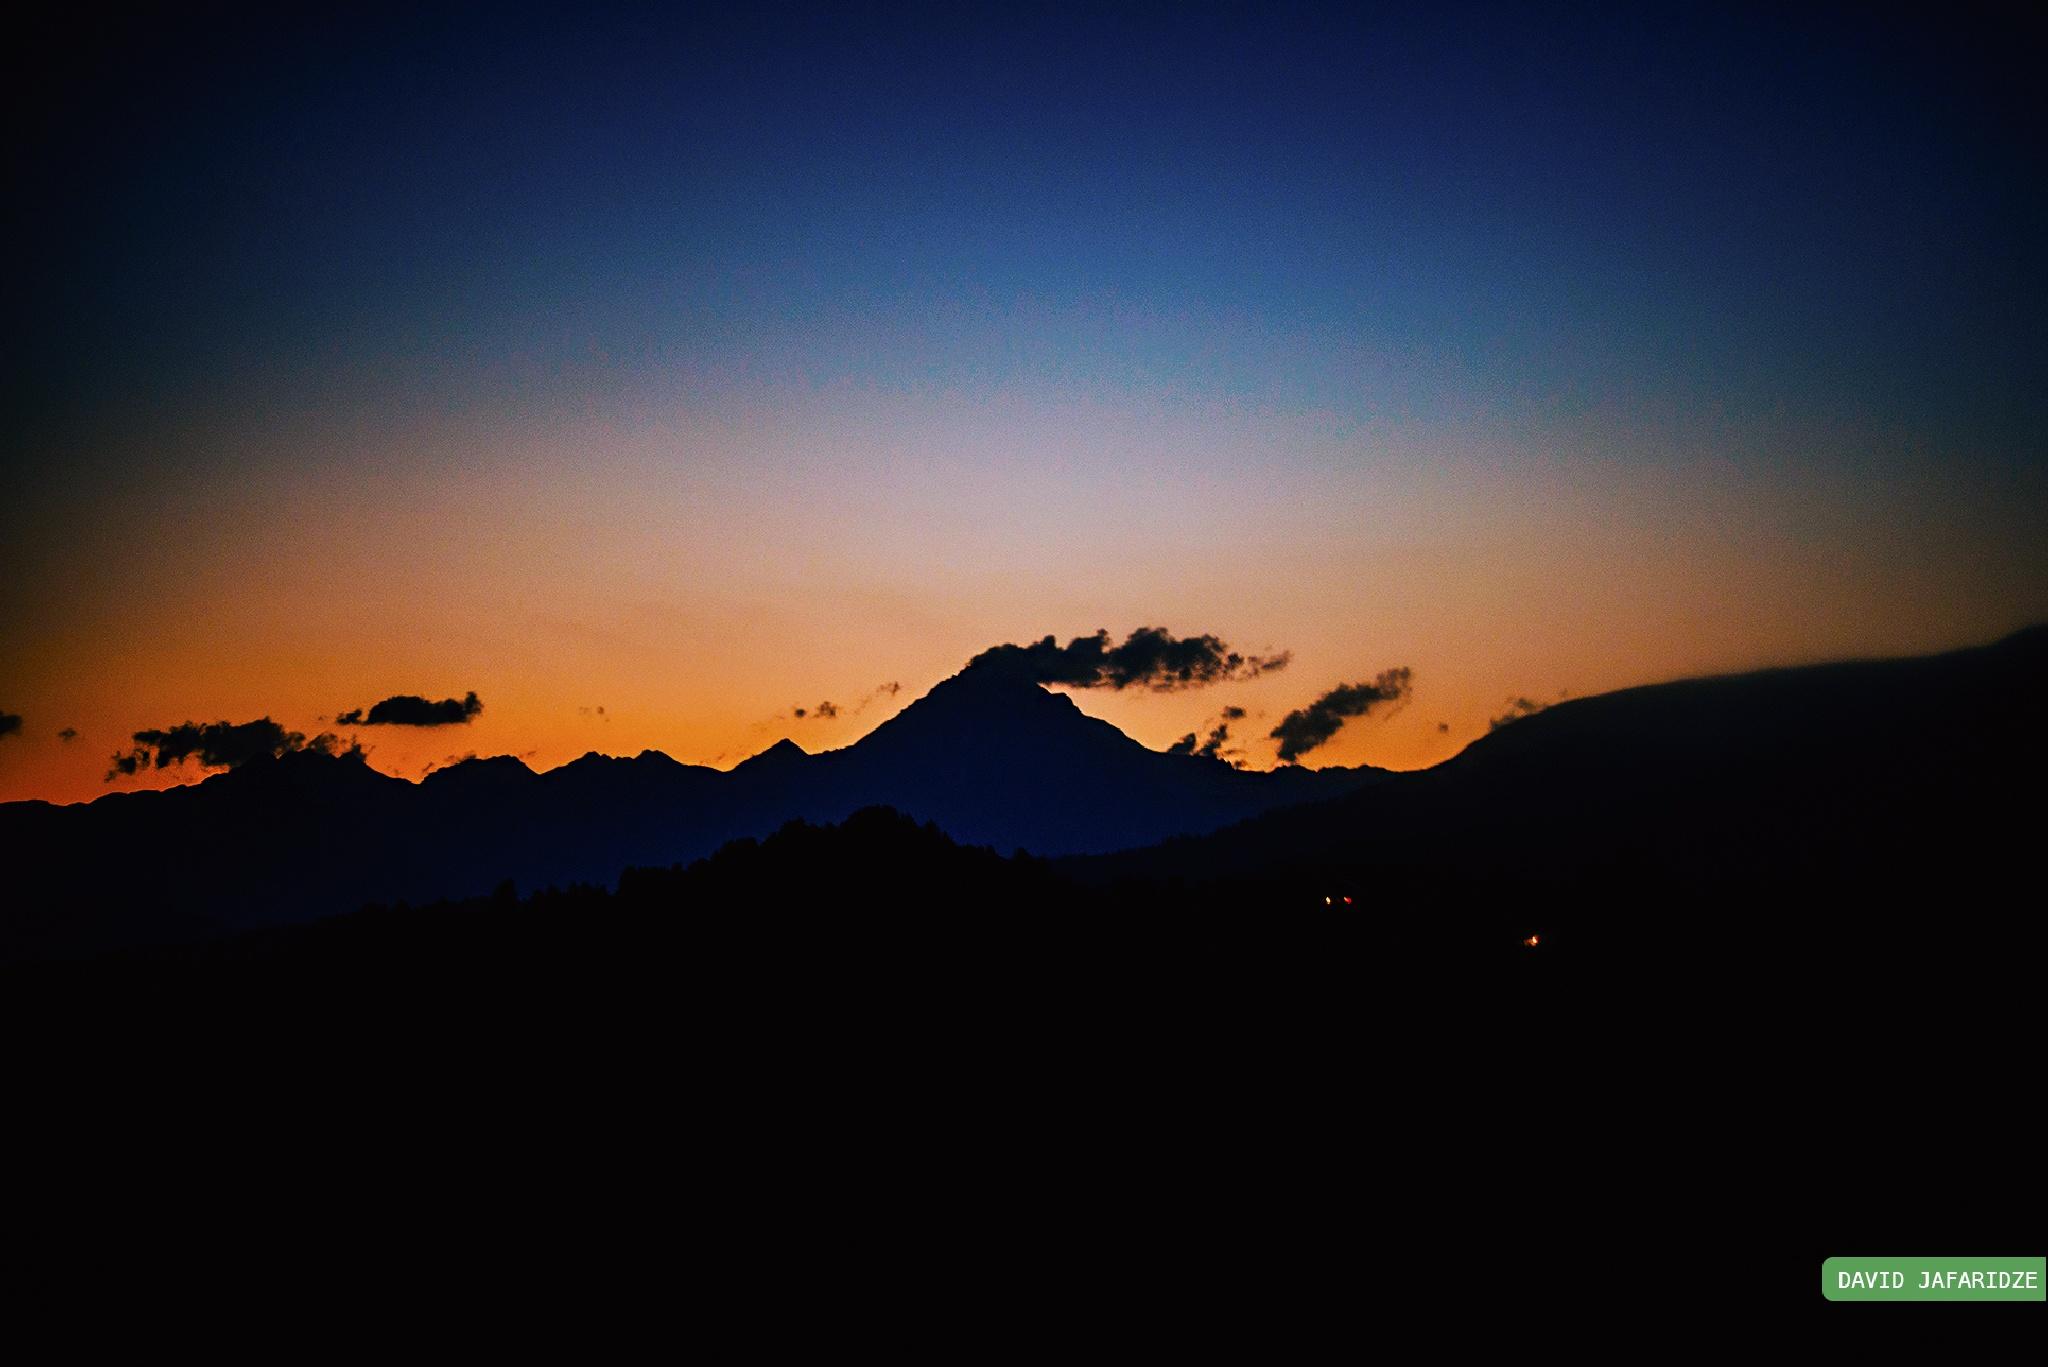 Mount by David Jafaridze